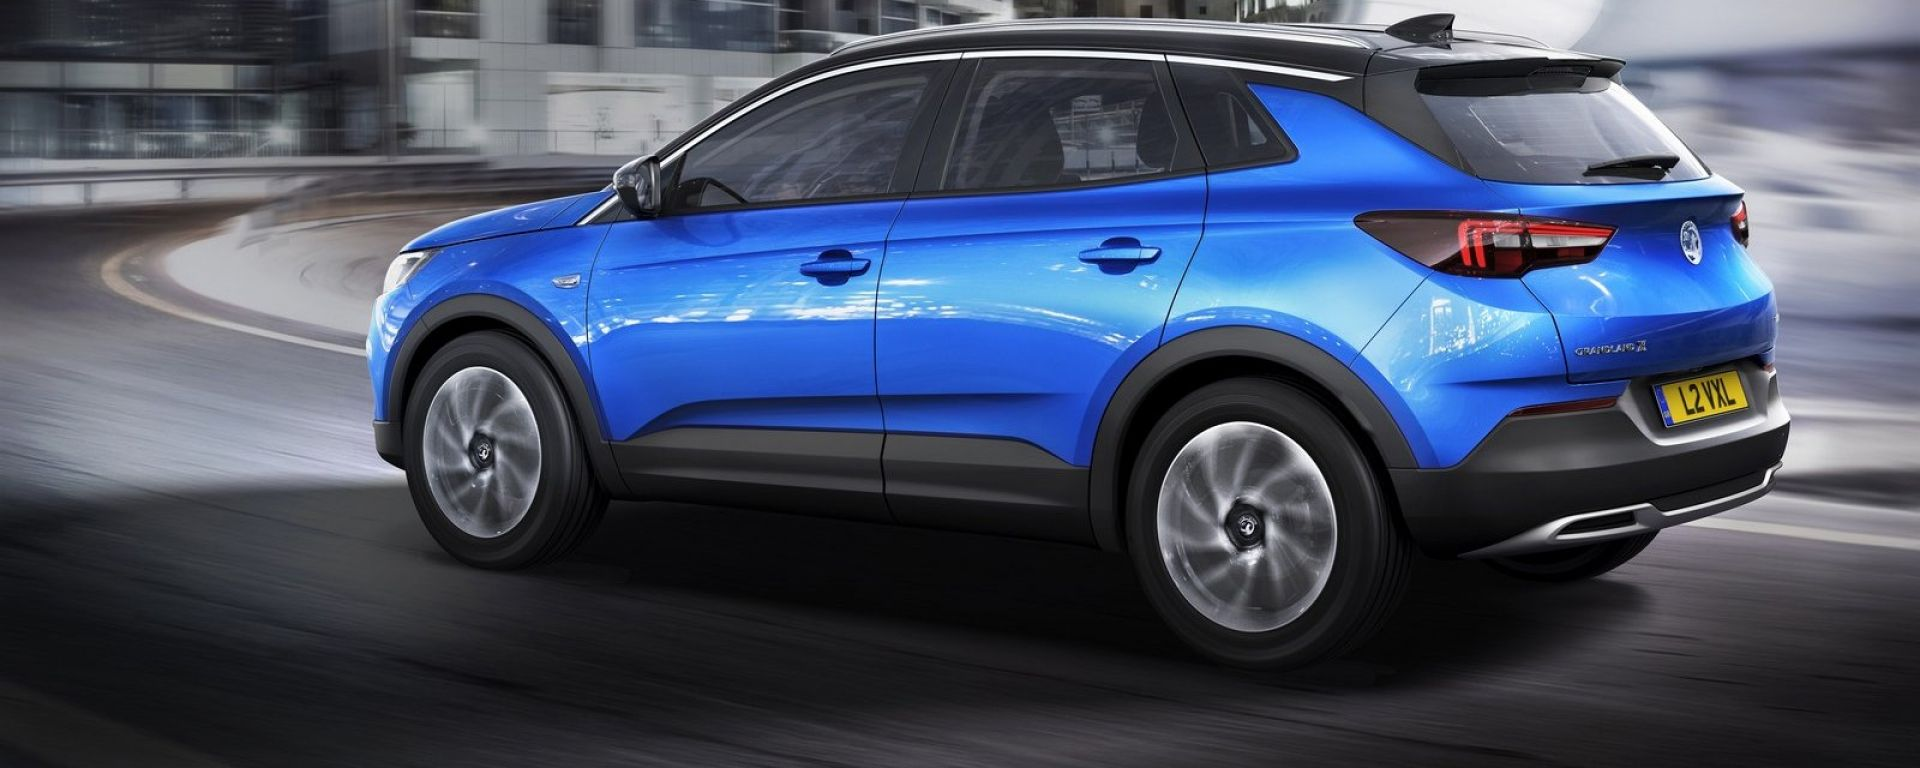 Opel Grandland X: vista laterale